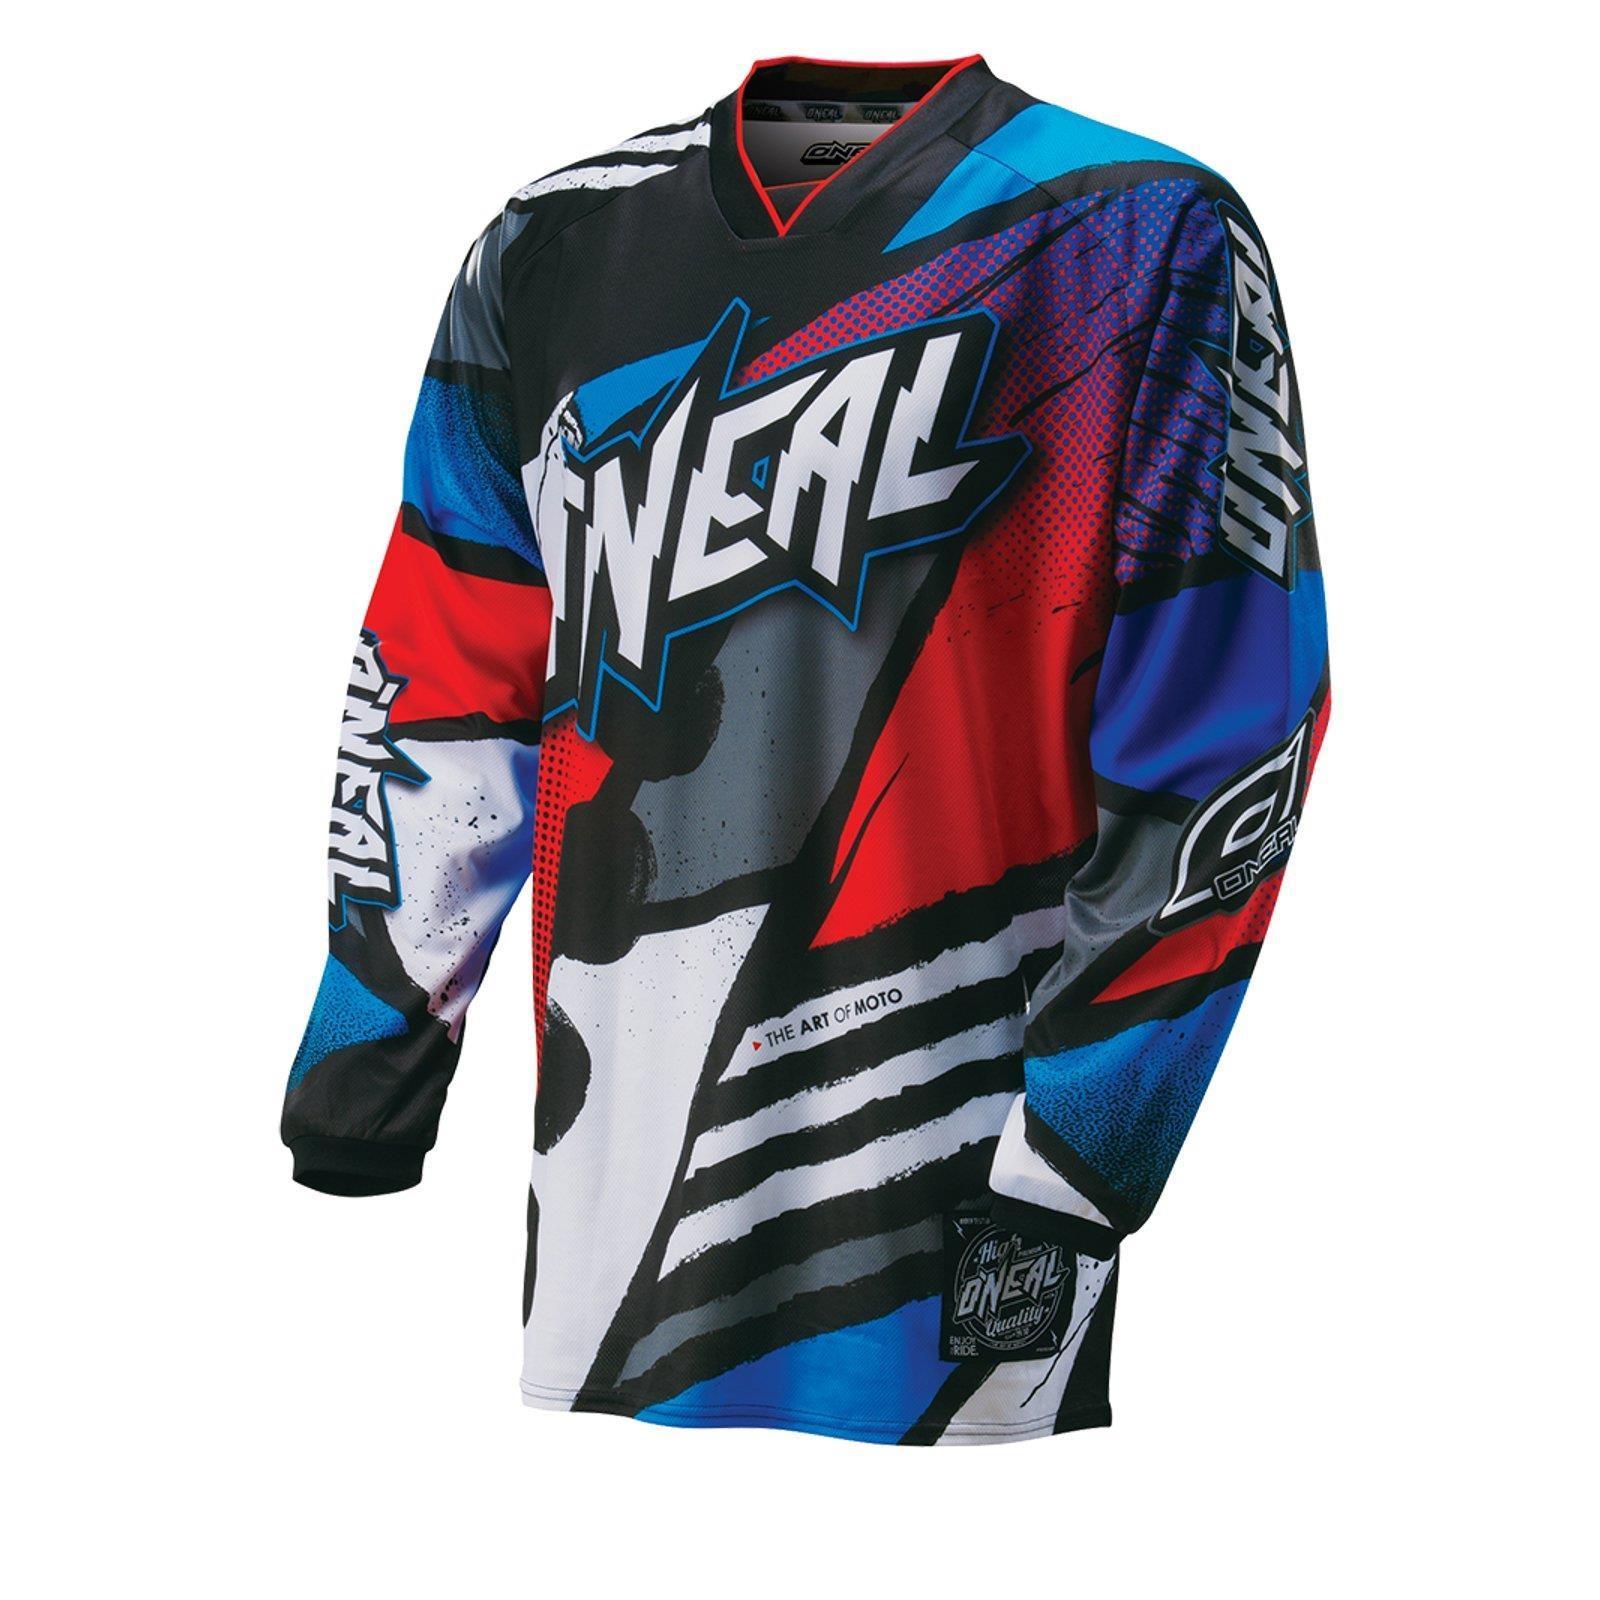 O-039-Neal-elemento-Mayhem-JERSEY-Racewear-Motocross-Maglia-MX-DH-FR-MTB-MOUNTAIN-BIKE miniatura 89